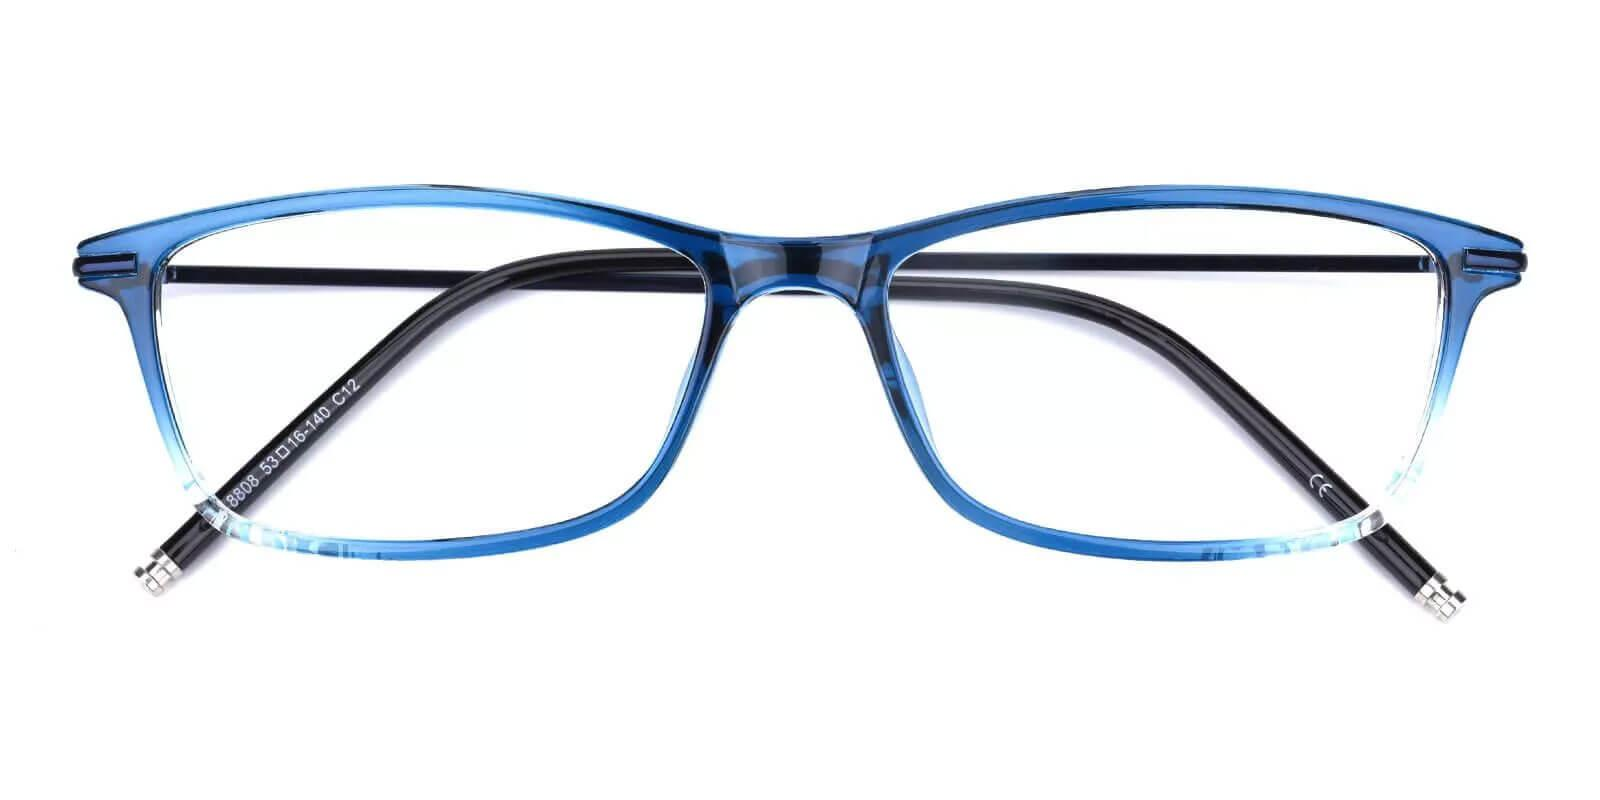 Maldives Blue TR Eyeglasses , Lightweight , UniversalBridgeFit Frames from ABBE Glasses